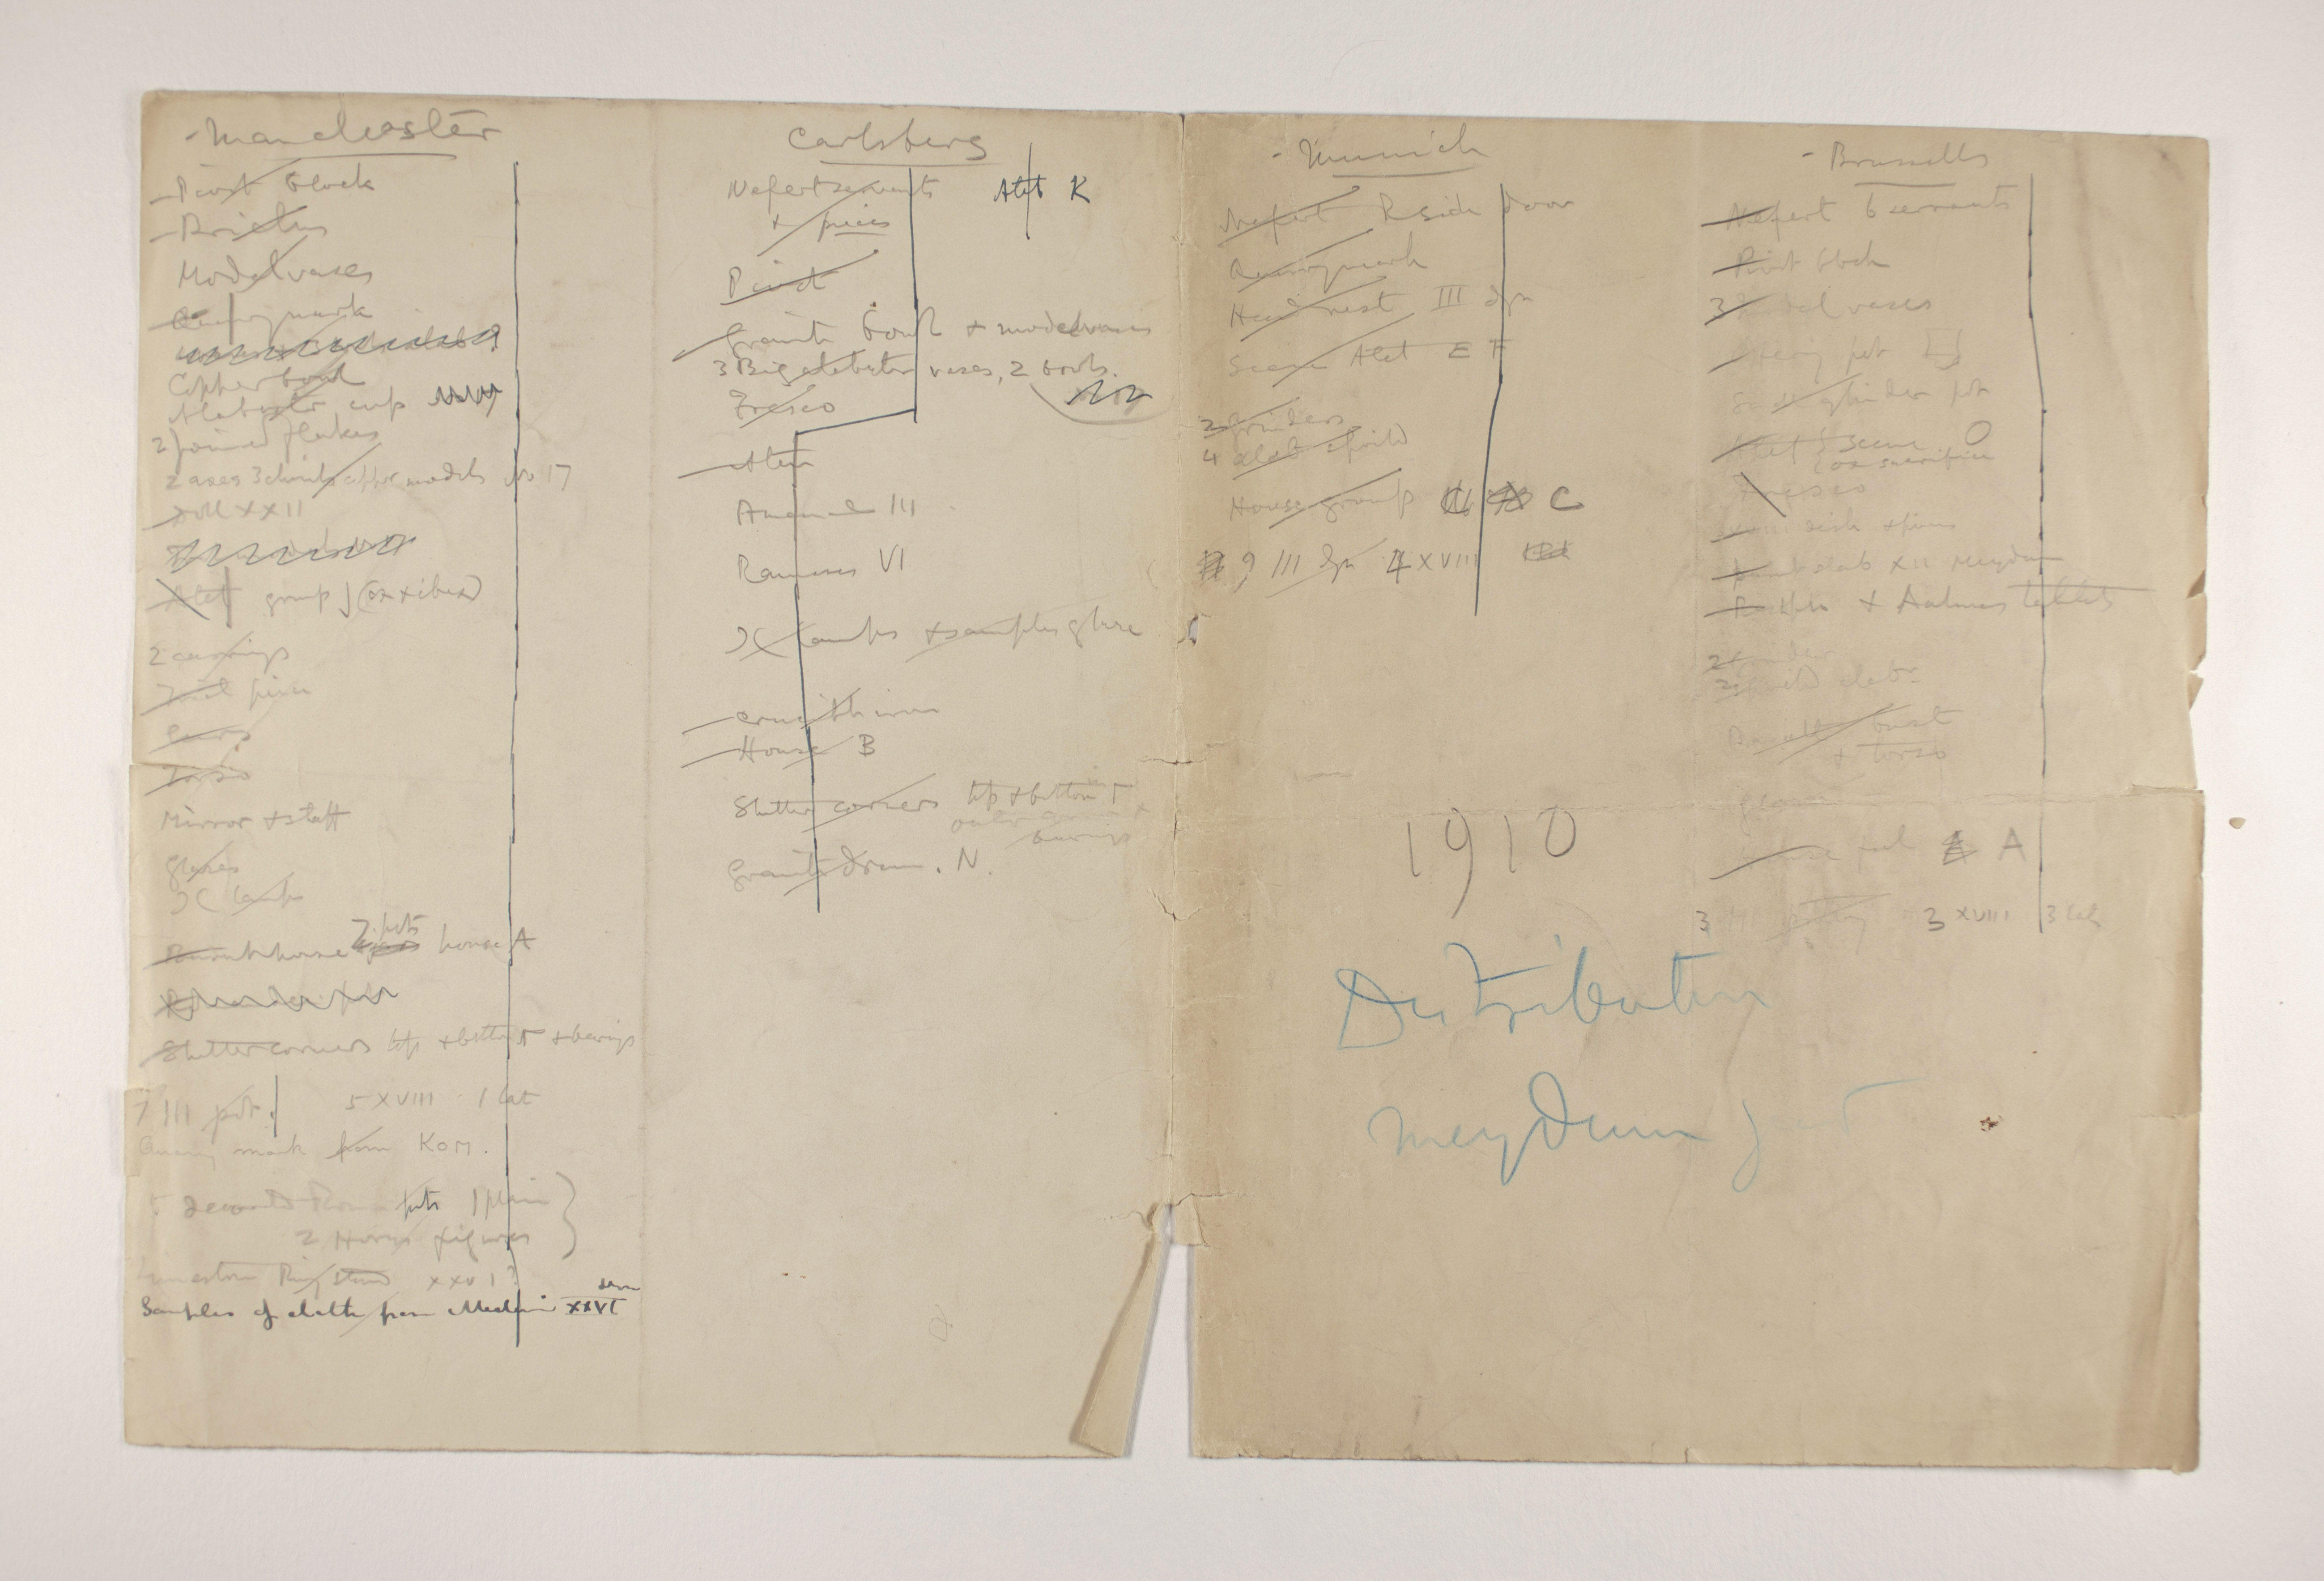 1909-10 Meidum, Memphis Multiple institution list PMA/WFP1/D/18/6